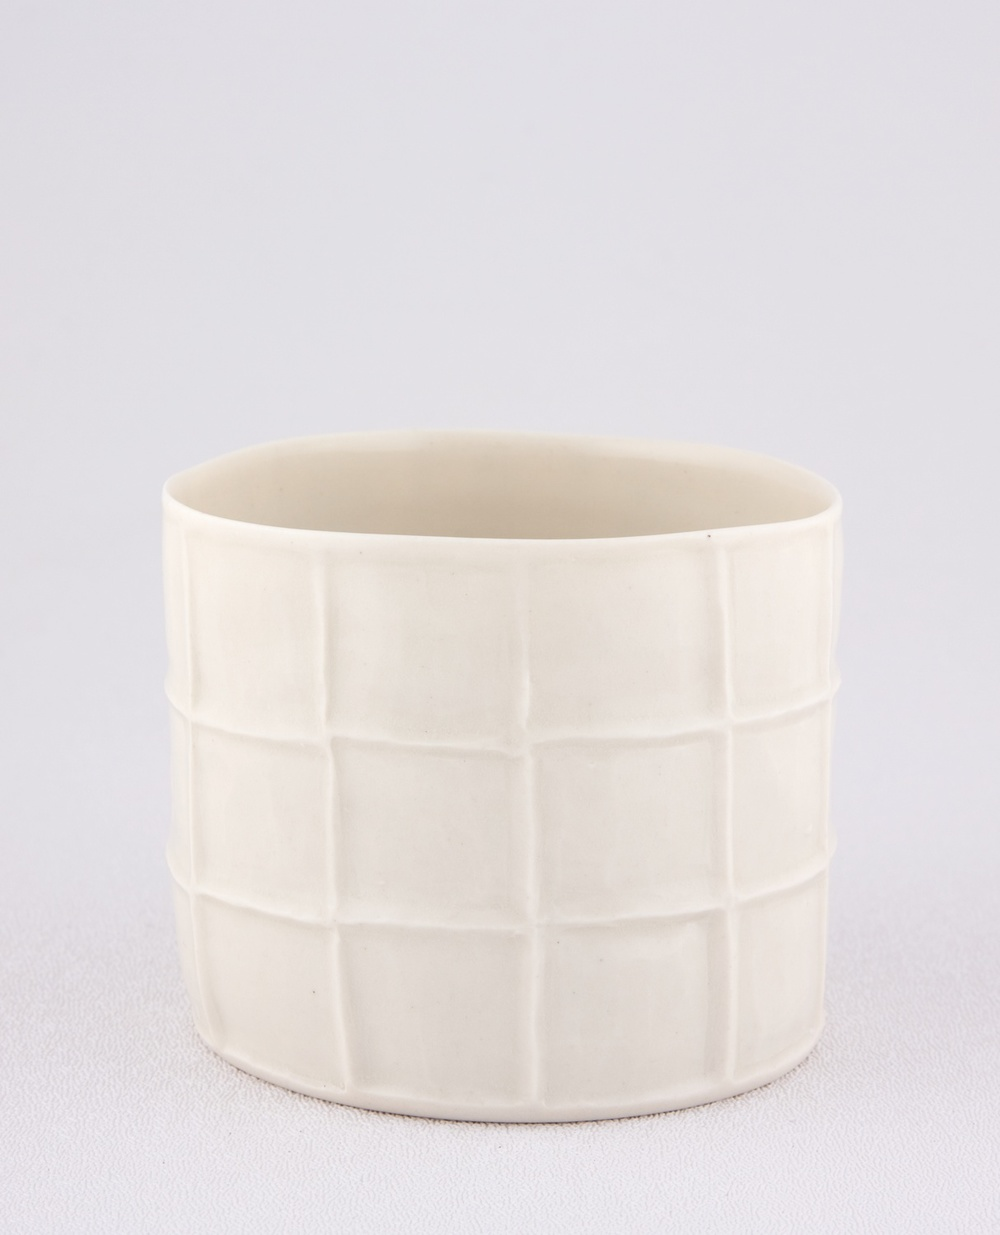 "Shio Kusaka Untitled (cup) 2009 Porcelain 2 3/4"" x 3 1/4"" SK011"